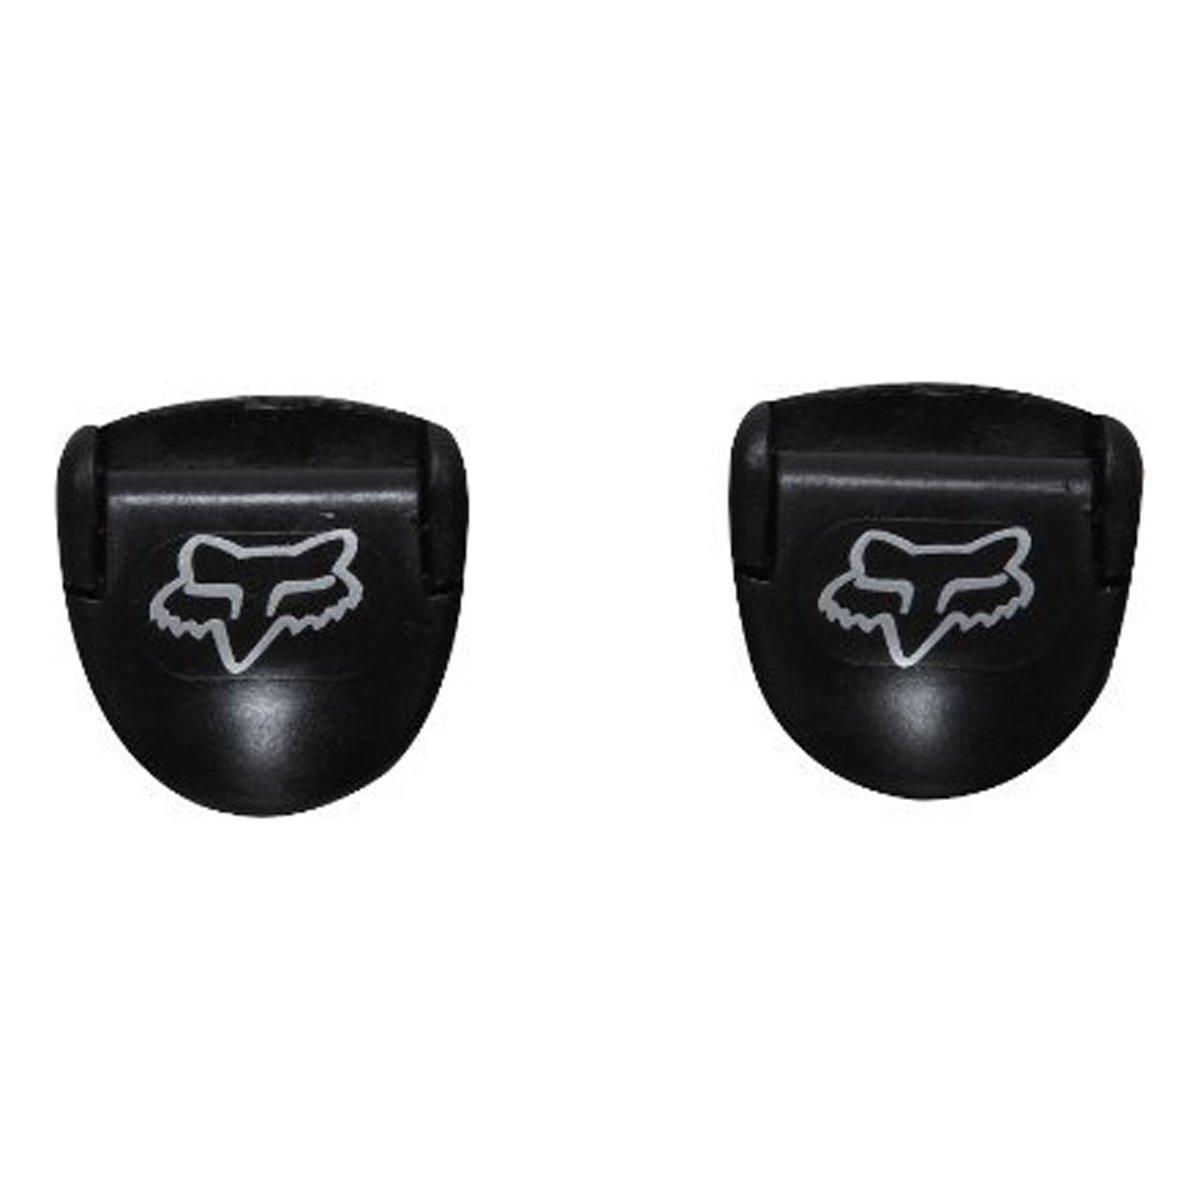 Fox Racing Flux Strap Adjustment Clip Black No Size